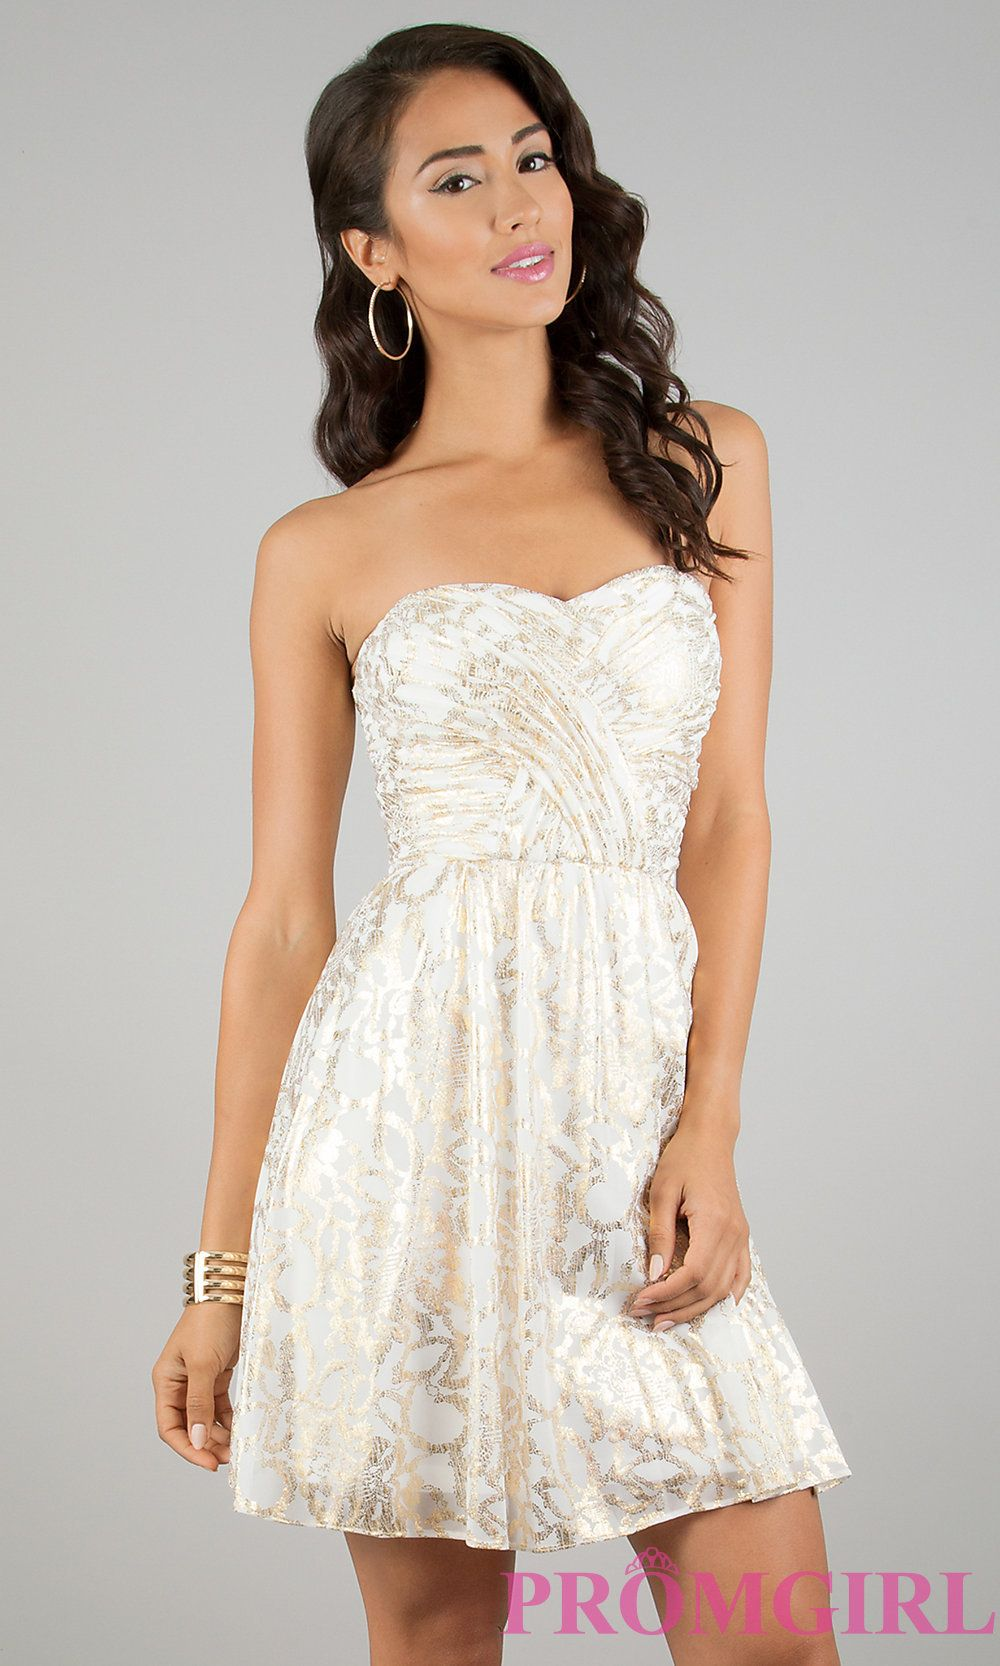 Short prom dress style hls front image for meg